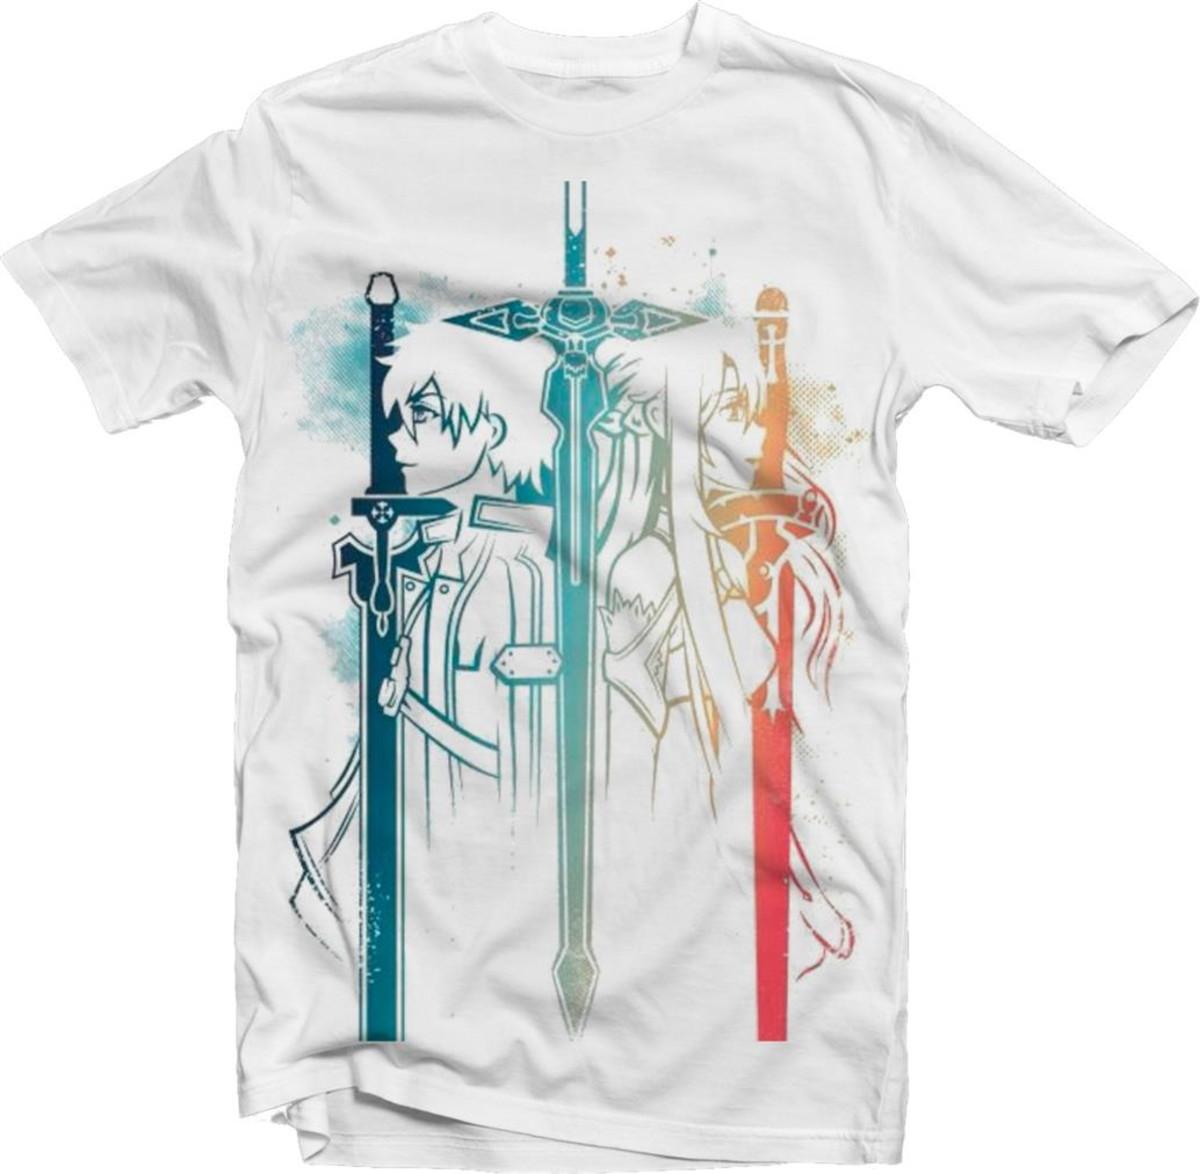 2db44c1c8 Camiseta Anime SAO Sword Art Online Kirito Asuna Branca 01 no Elo7 ...